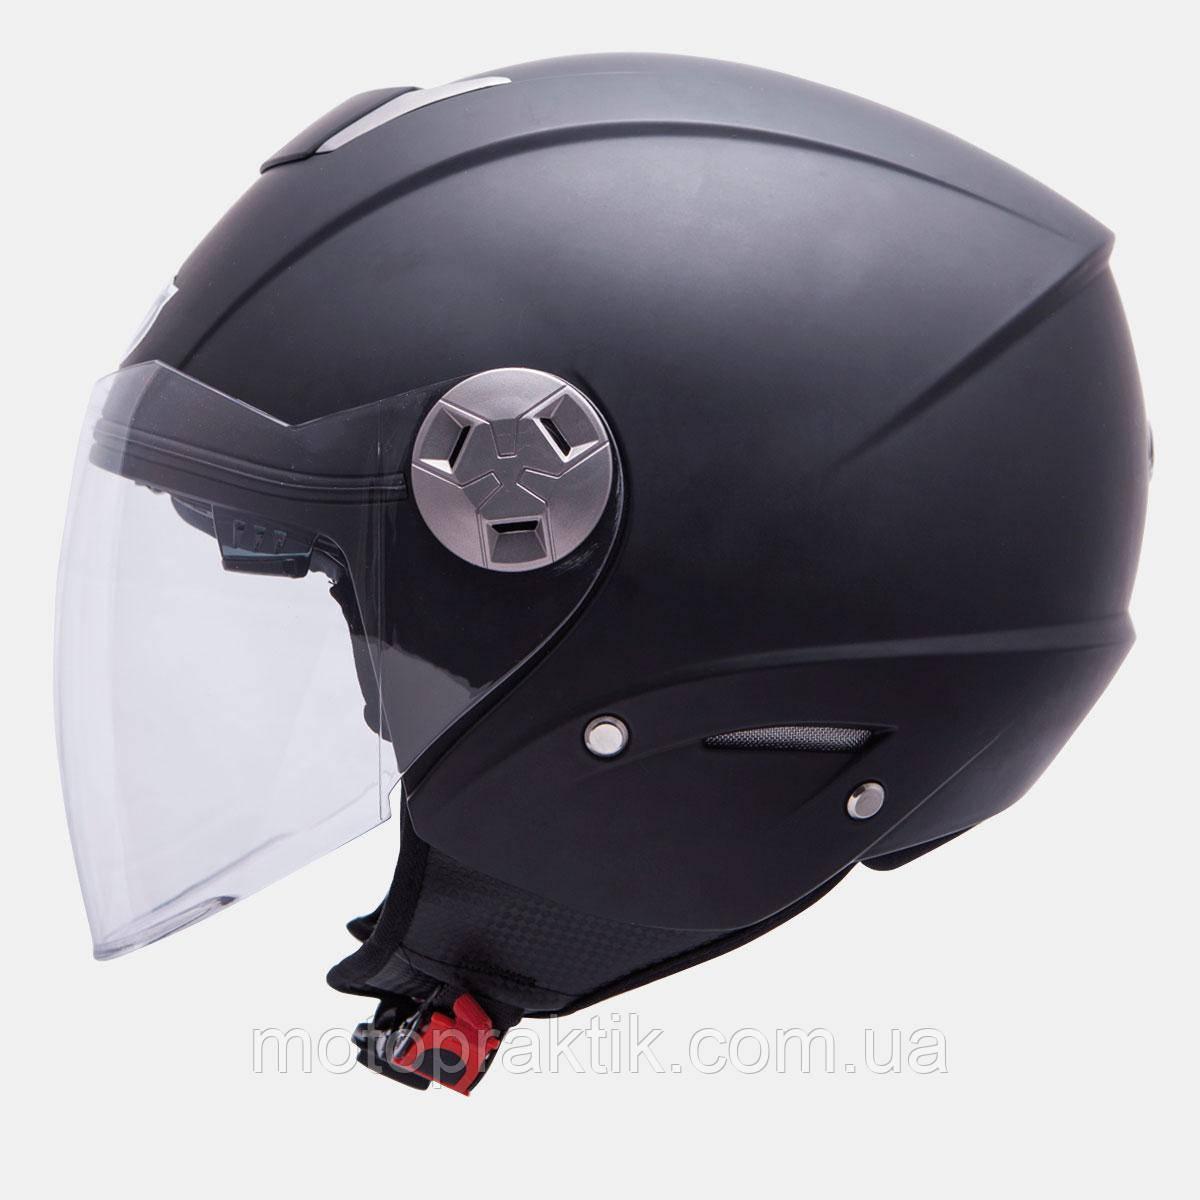 MT Сity Eleven SV Solid Matt Black, XS, Мотошлем лицевик